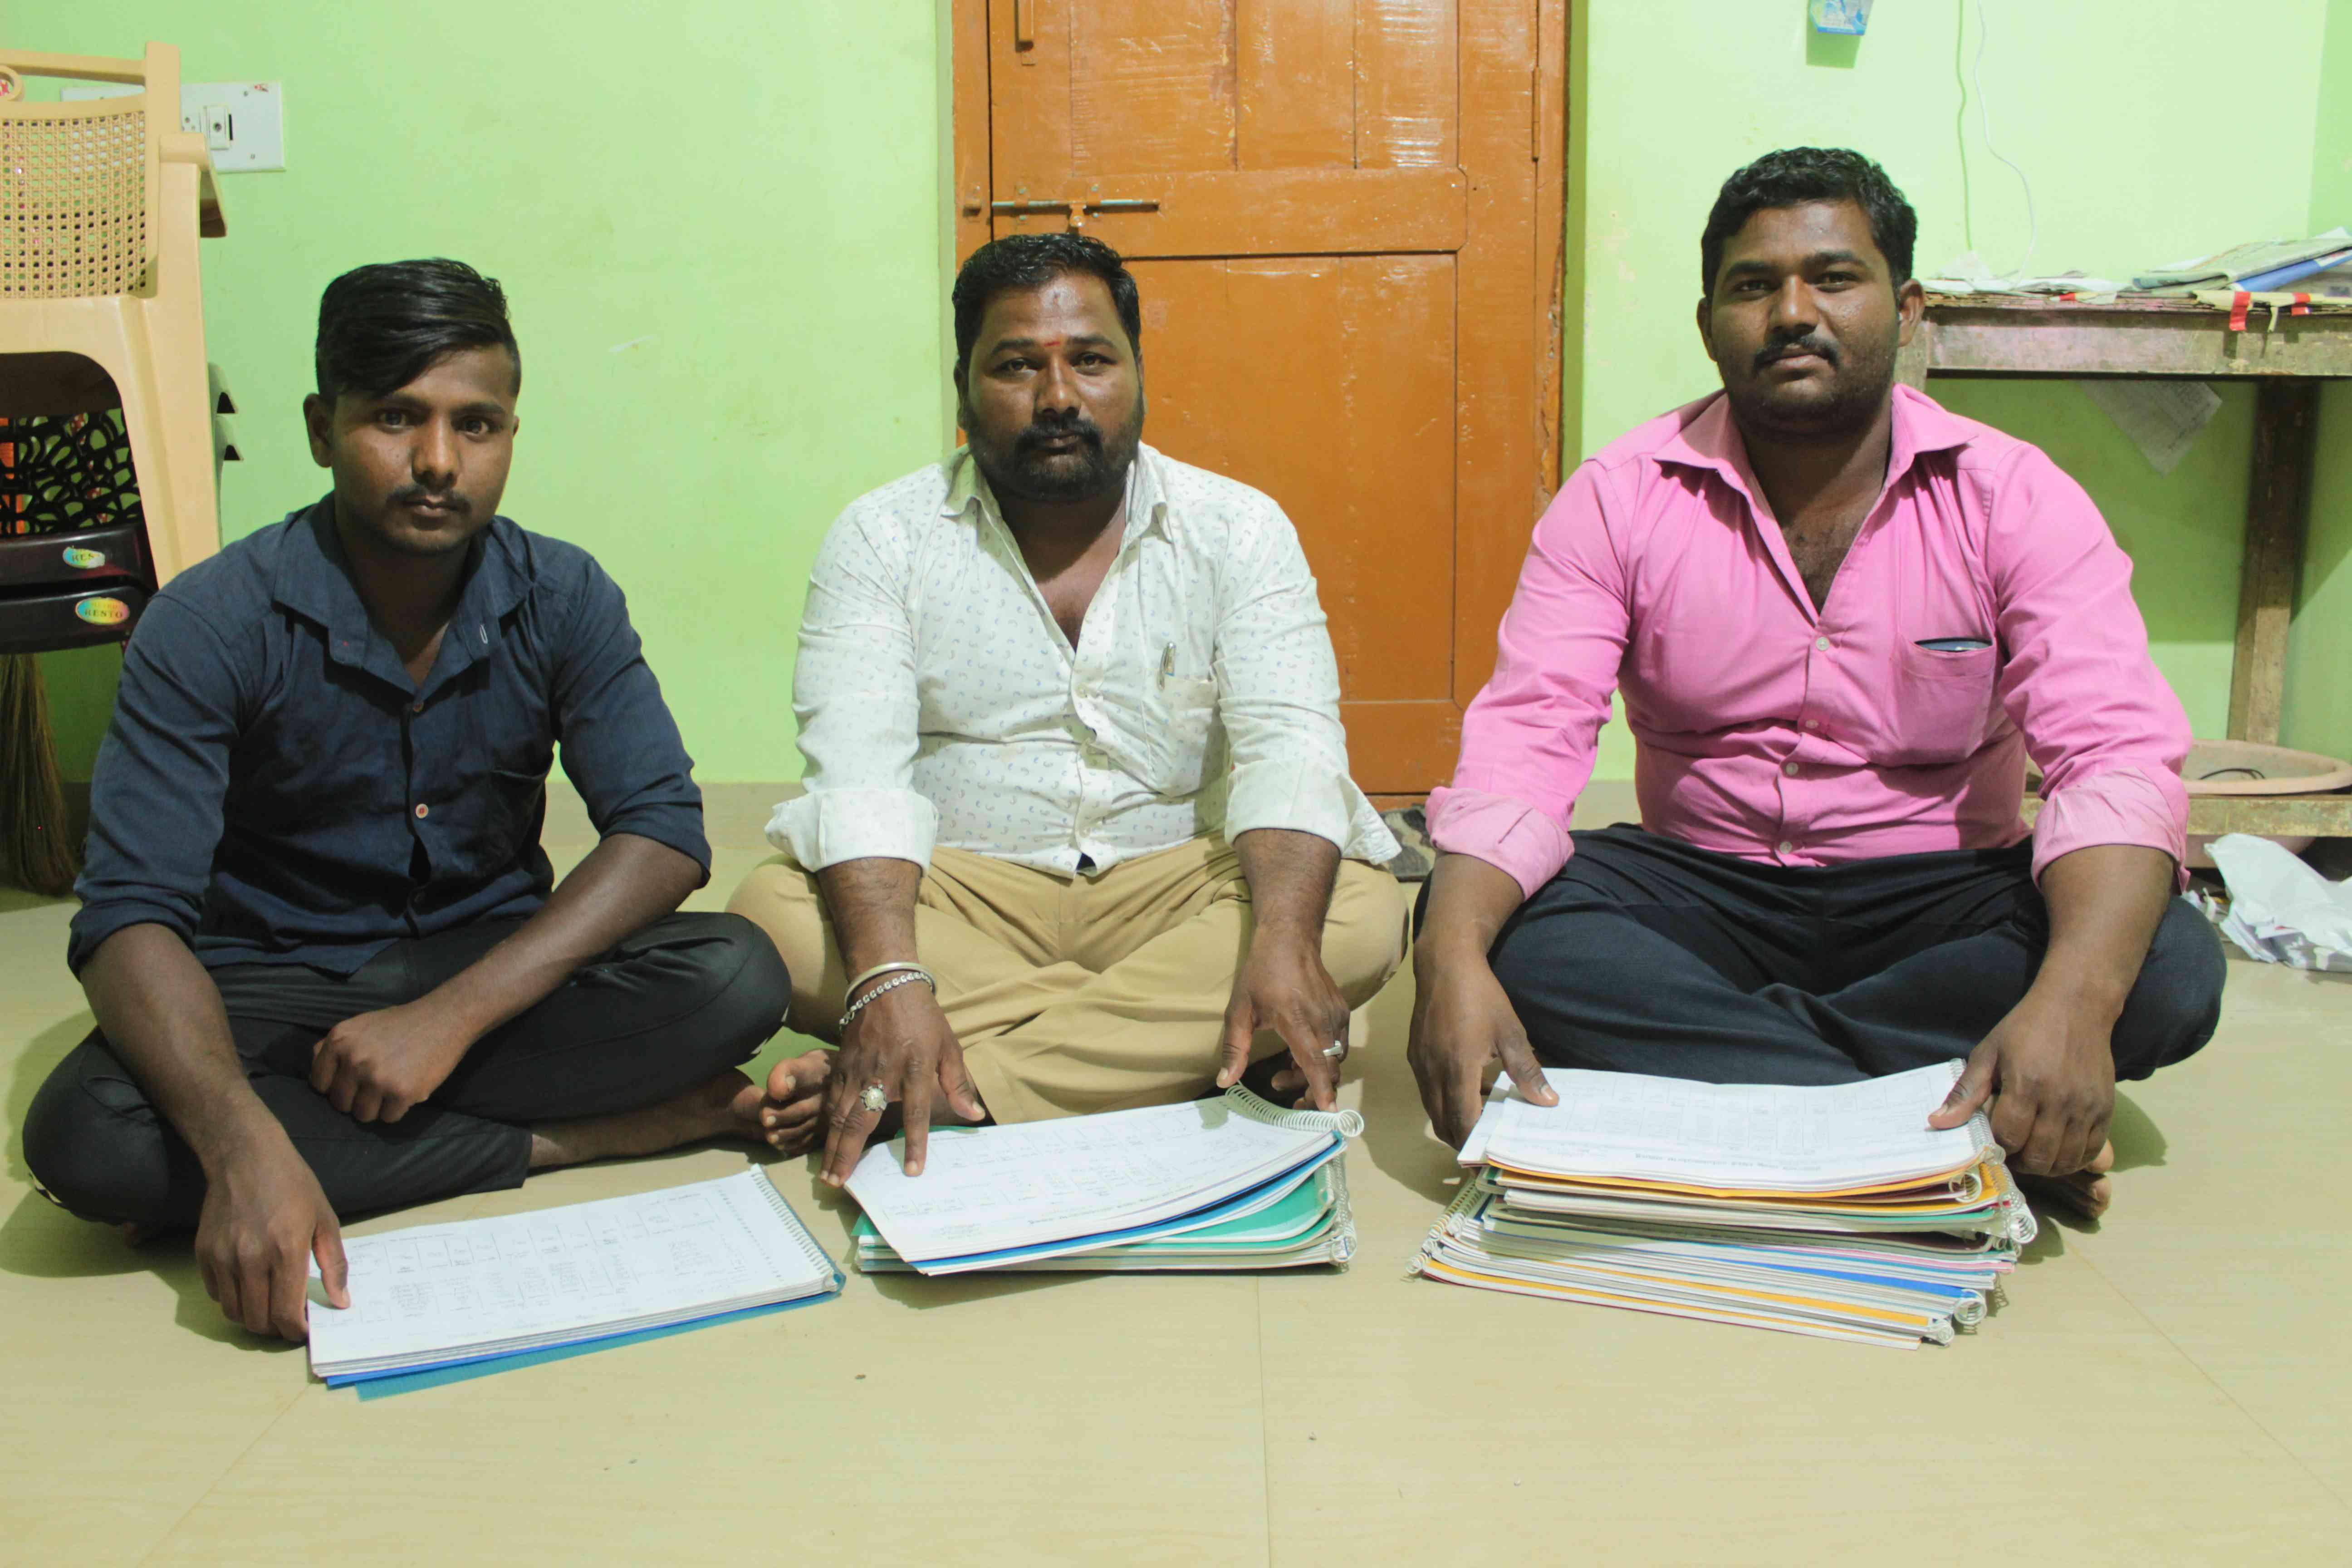 Marideva Mailappa Naduvinakeri with his teammates from Swabhimani Dalit Shakti in Ranebennur town.